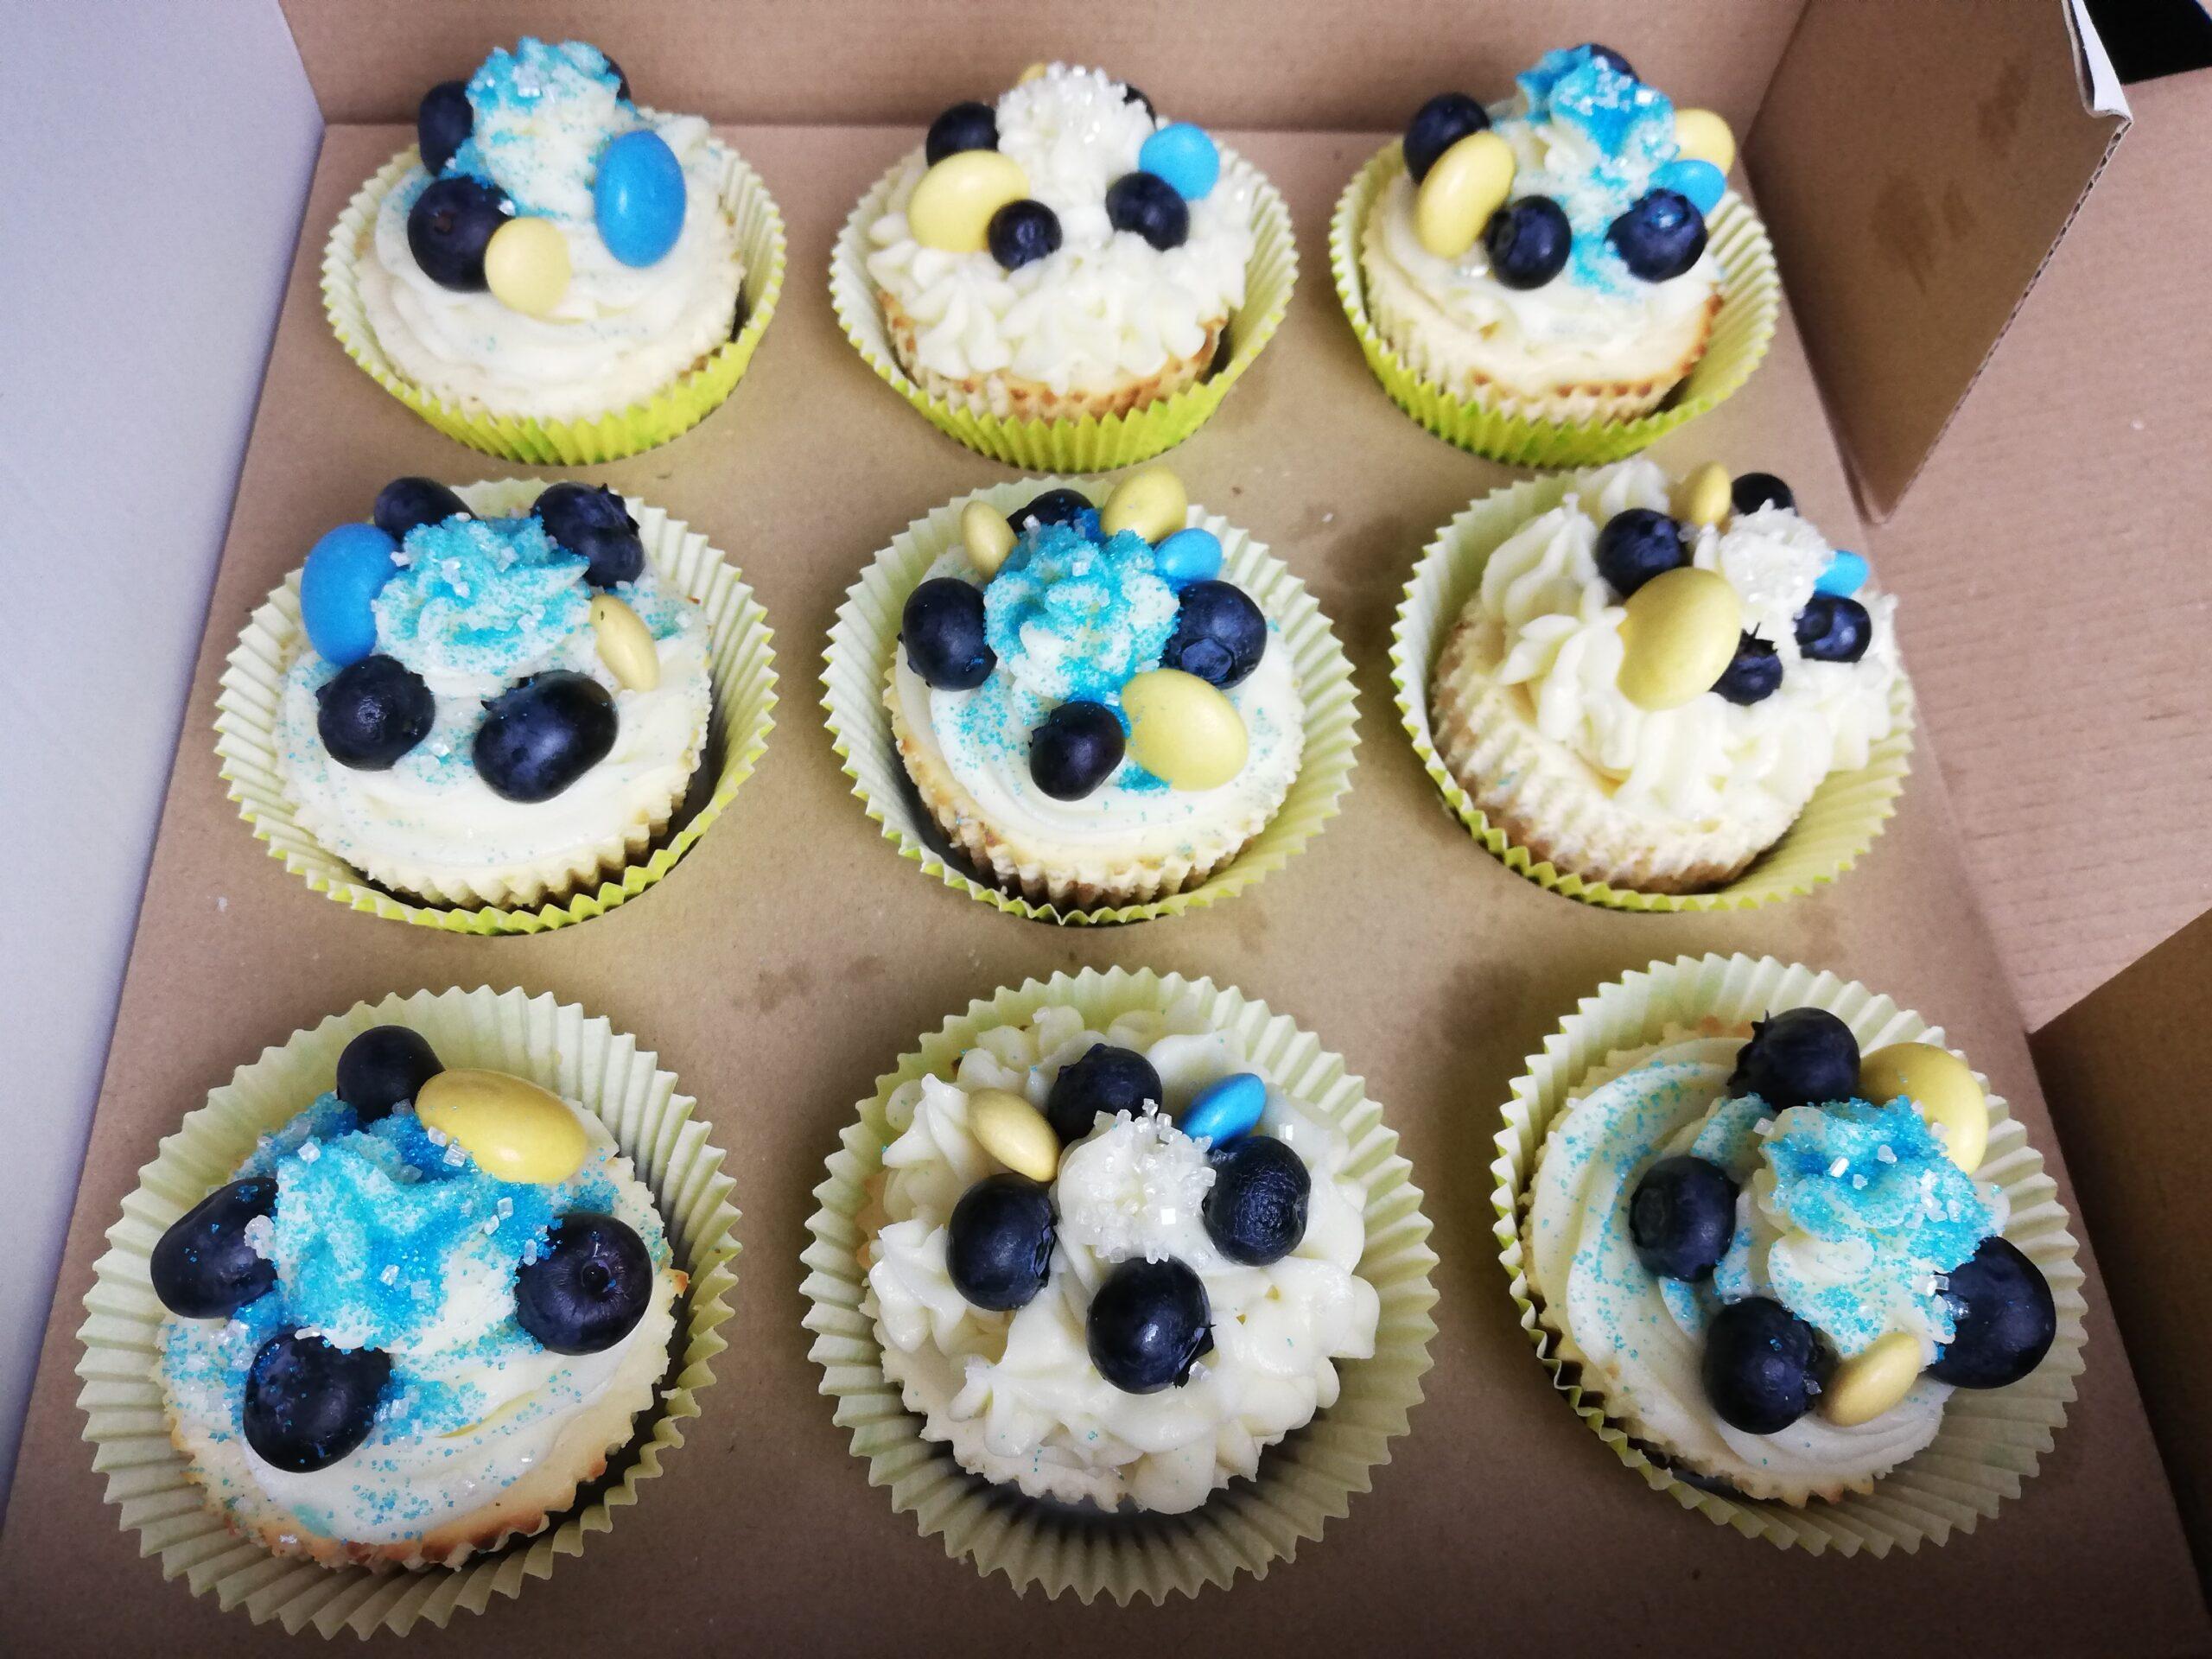 Individual Cheesecake Cupcakes